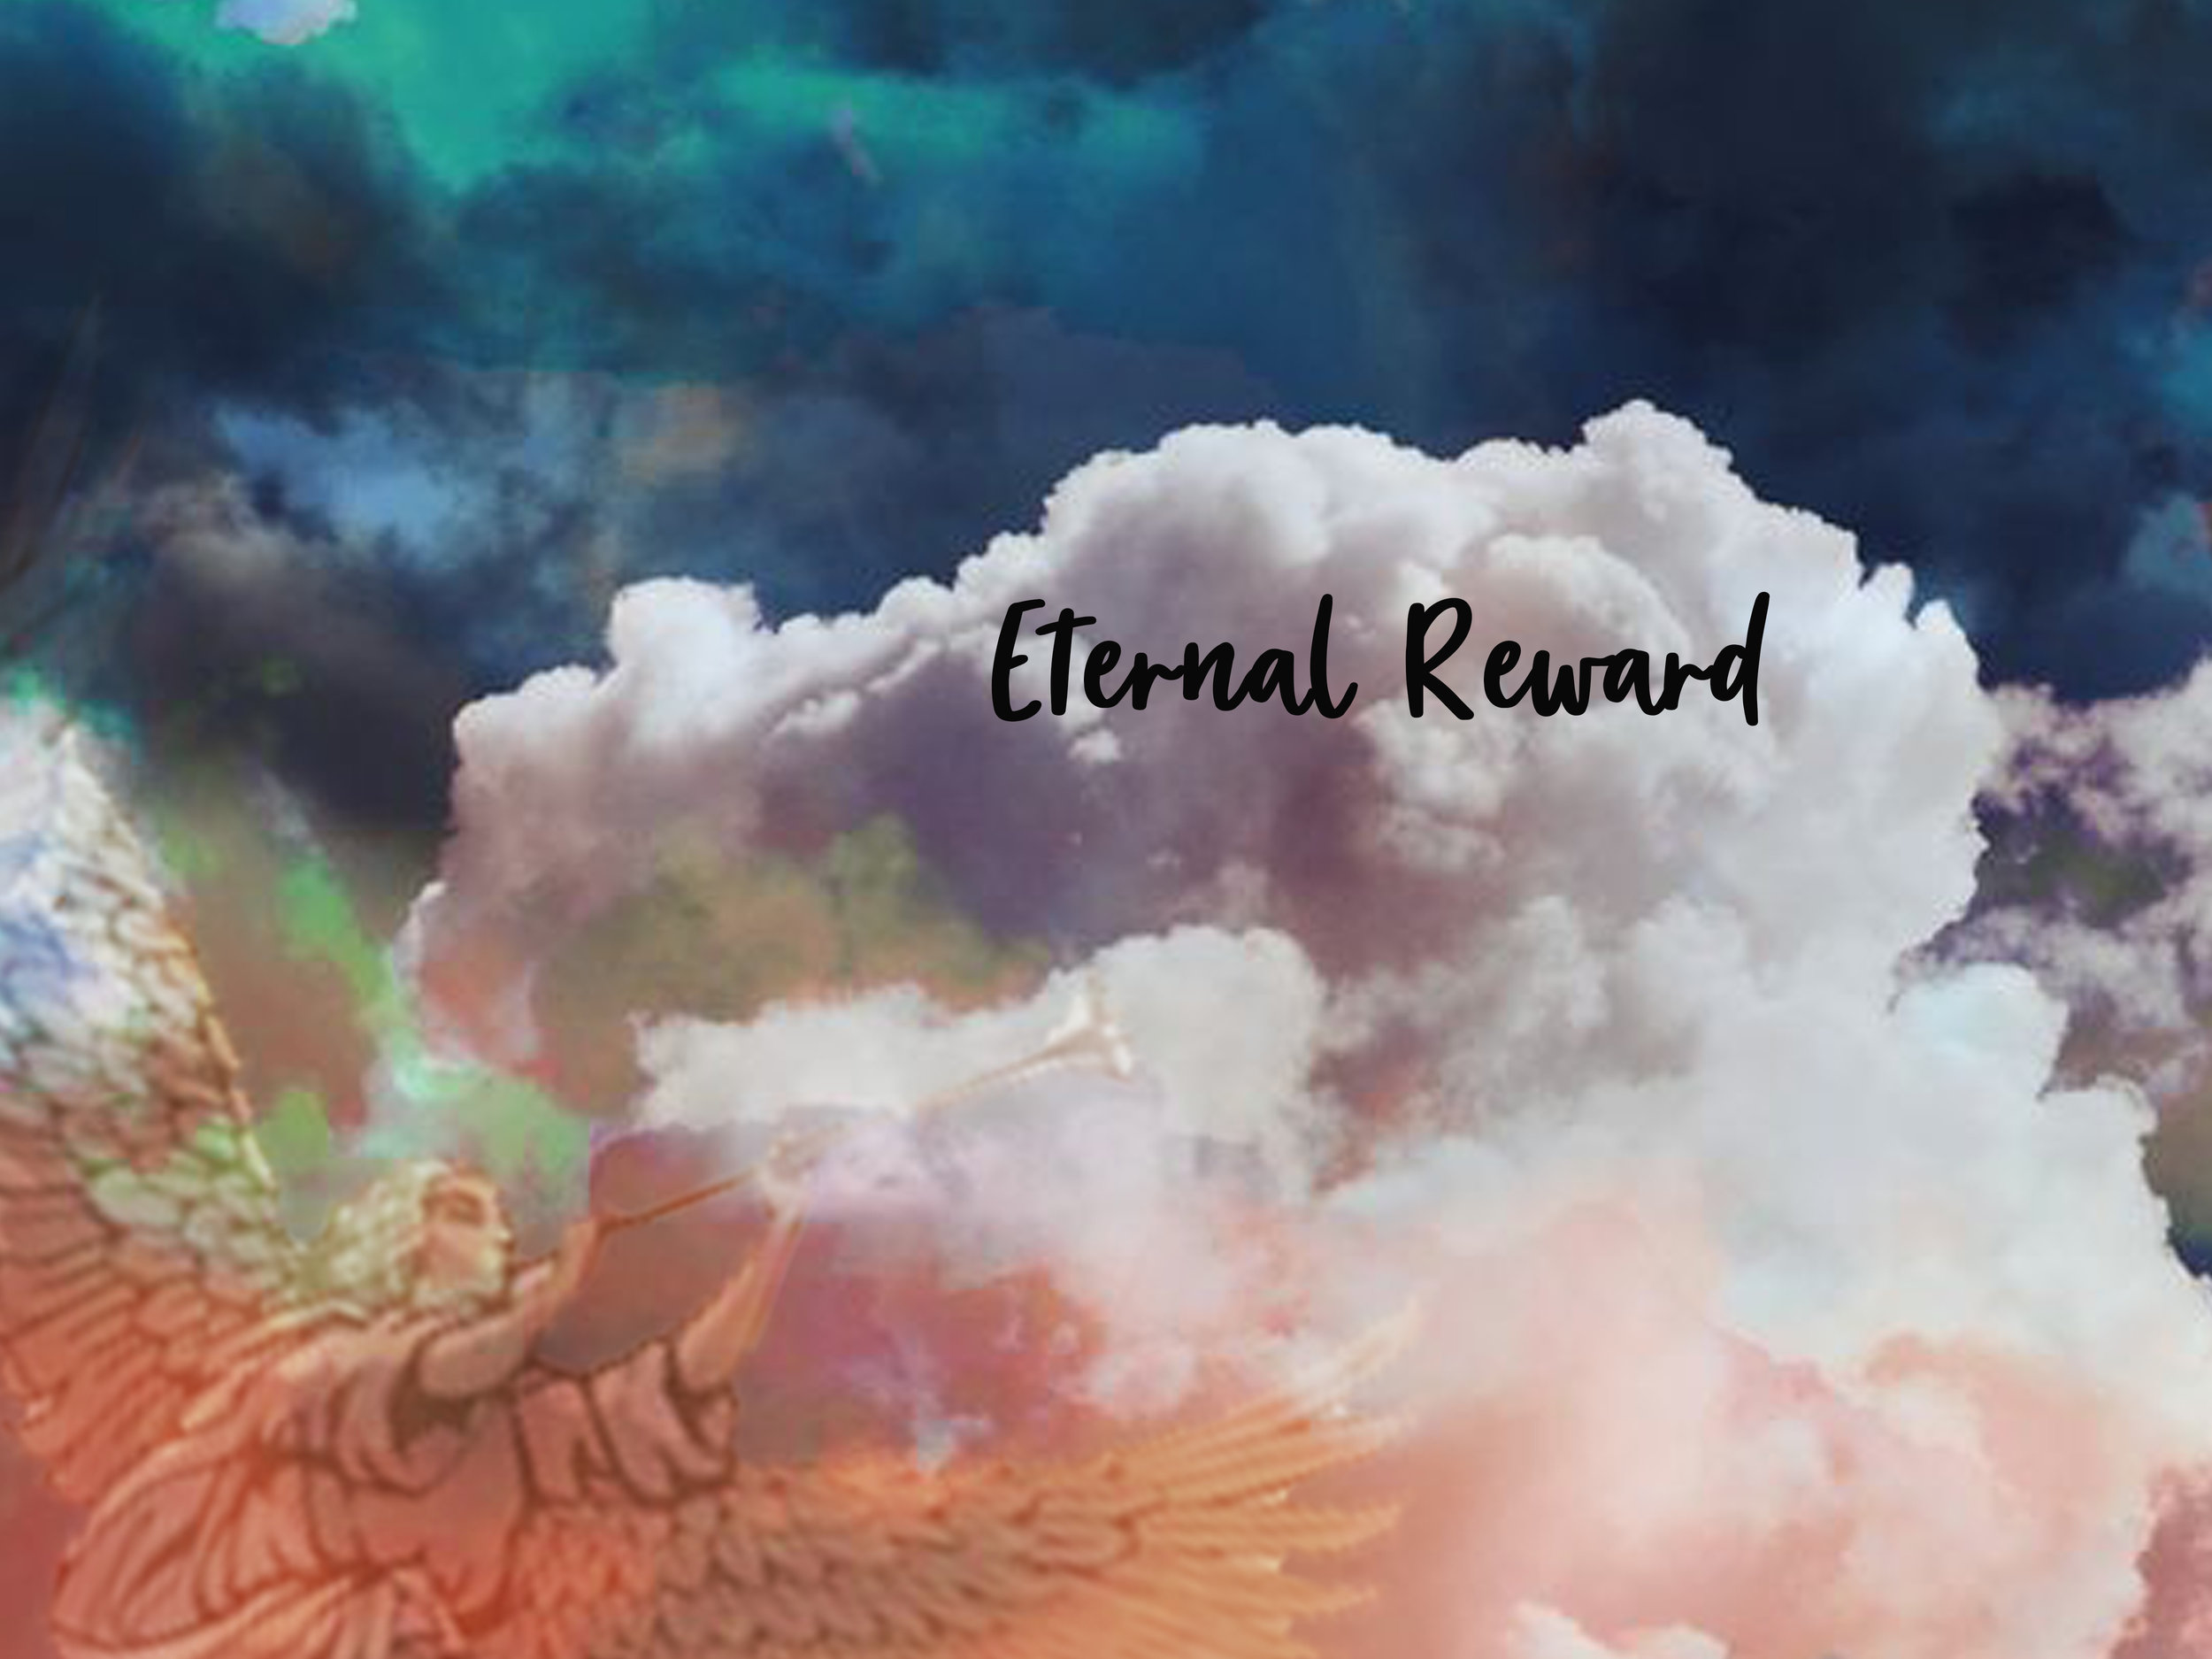 eternal reward.jpg